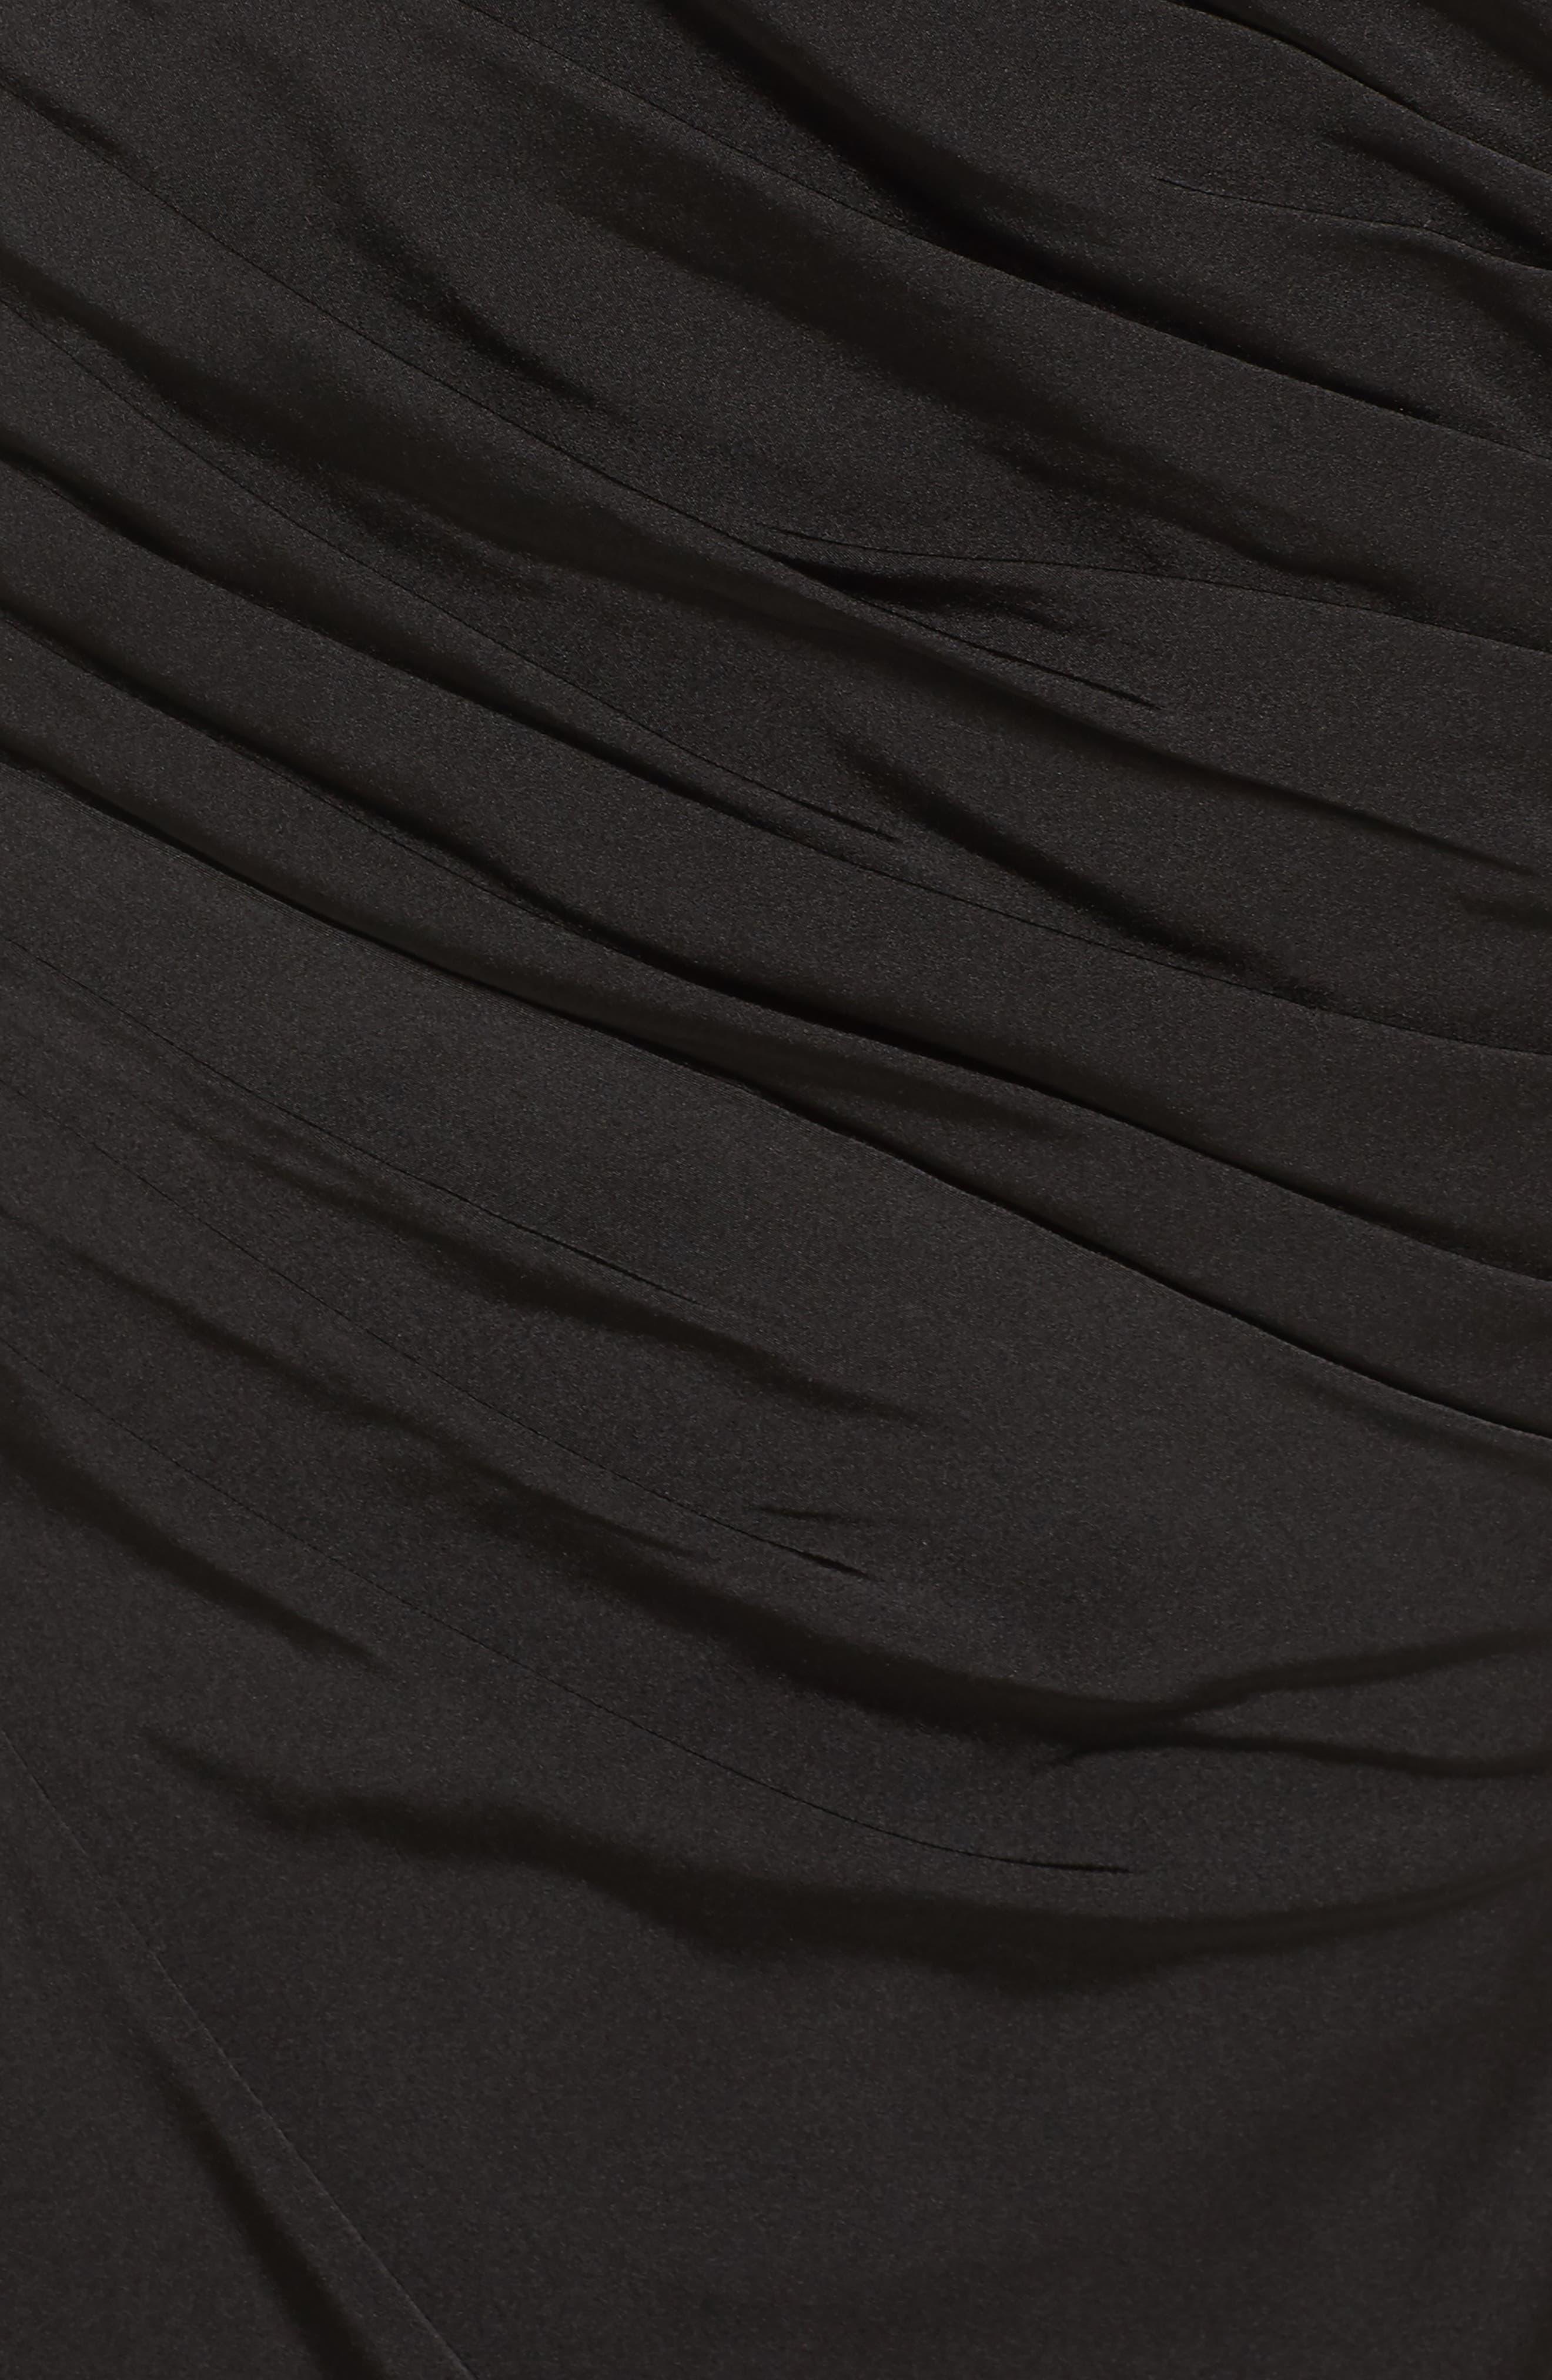 Sheer Sleeve Gown,                             Alternate thumbnail 5, color,                             BLACK